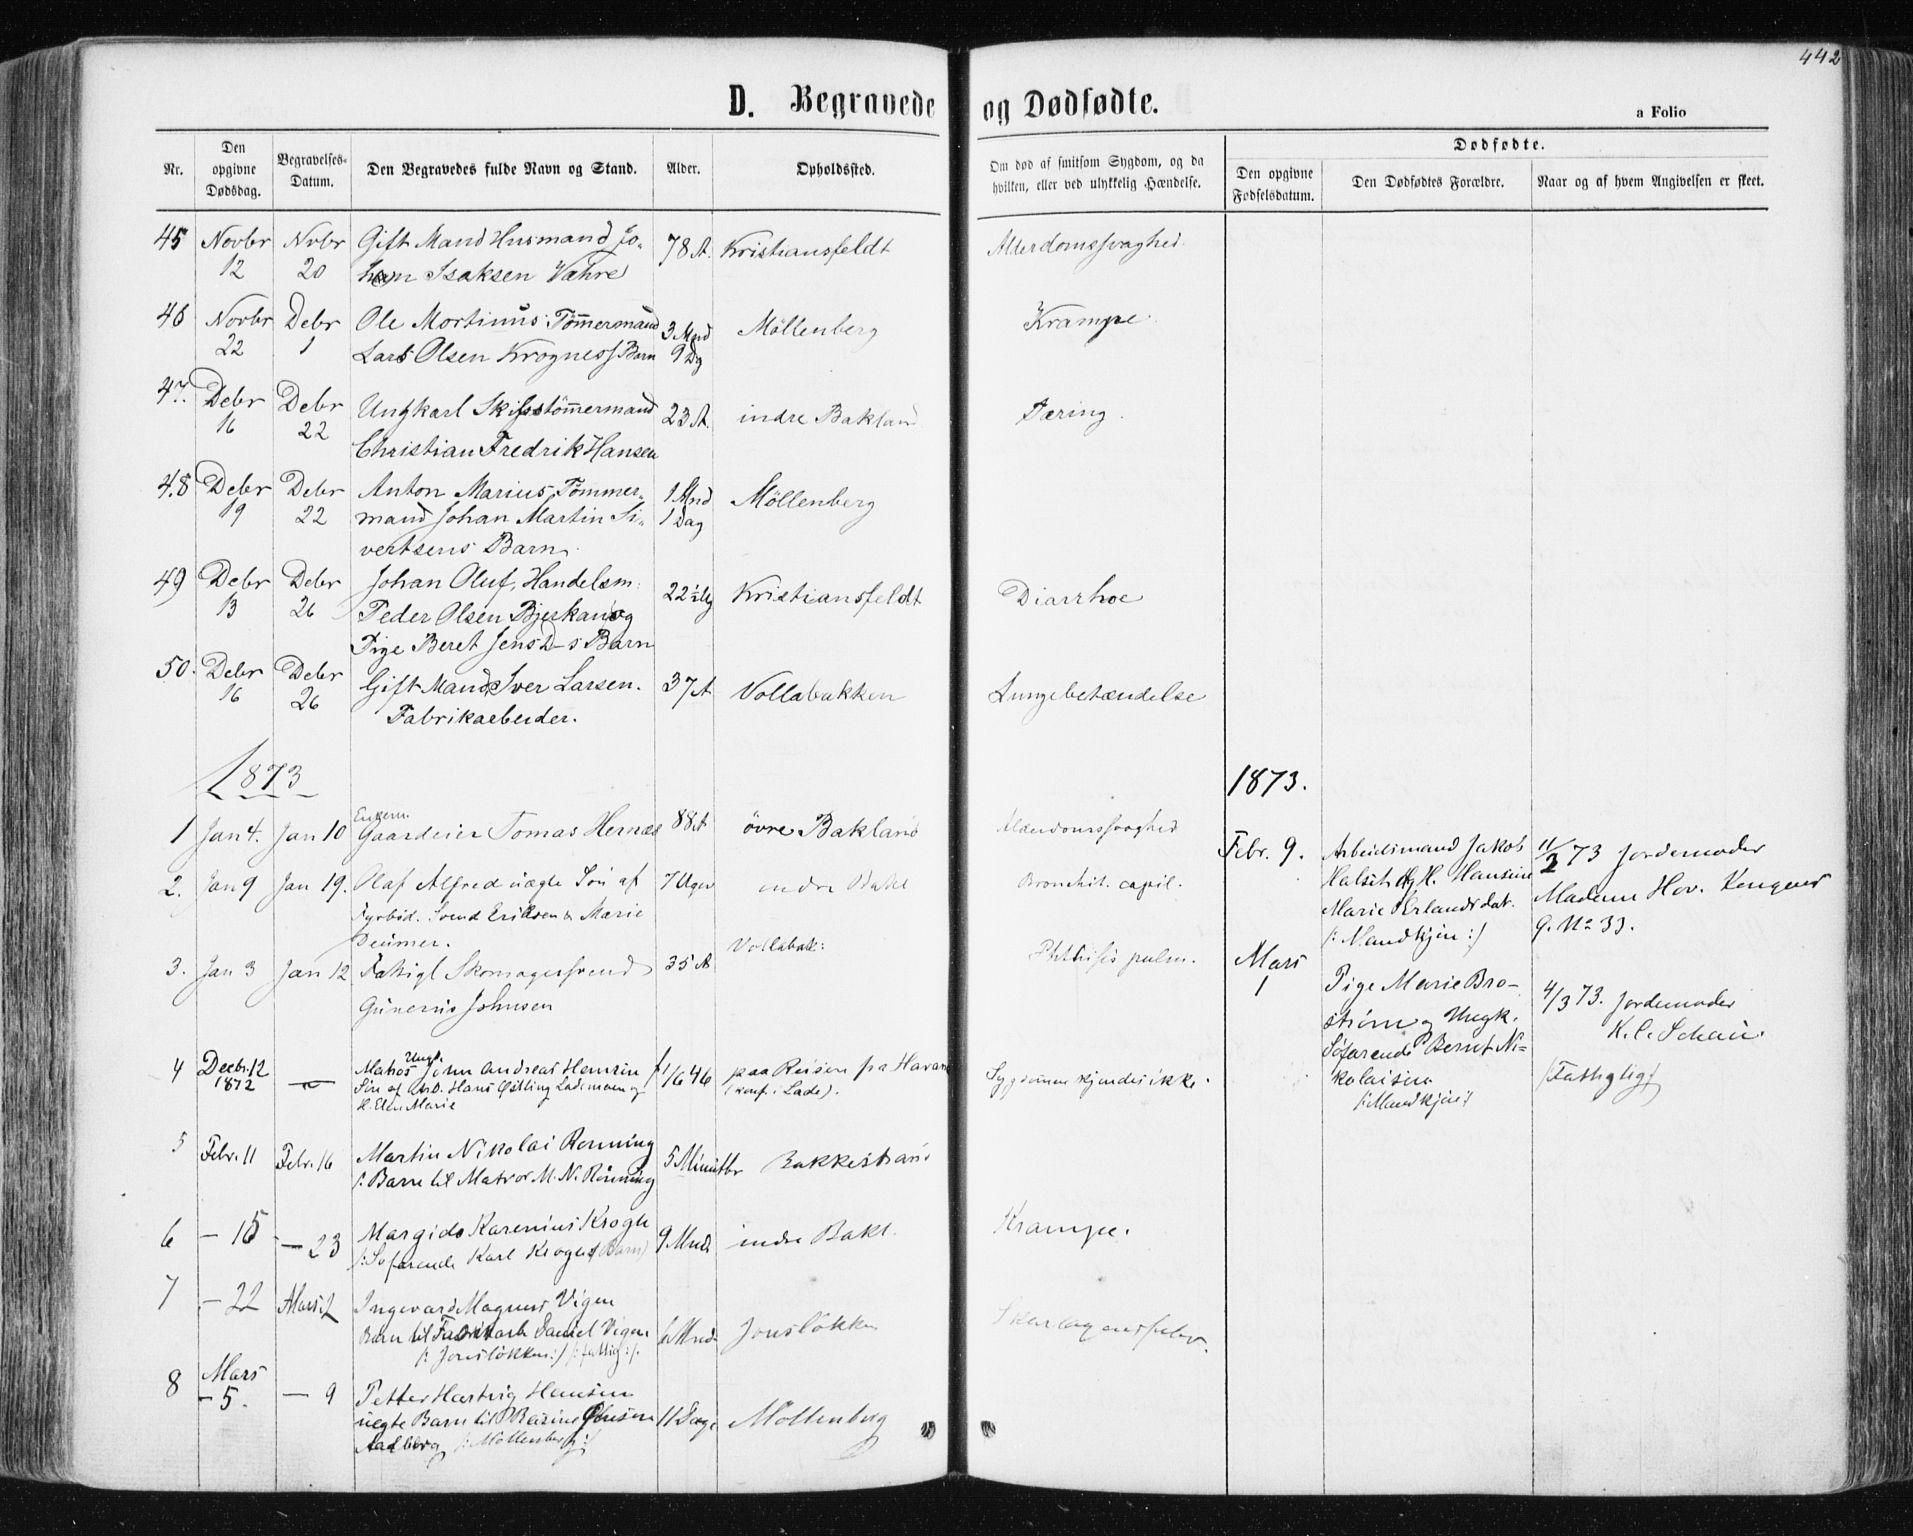 SAT, Ministerialprotokoller, klokkerbøker og fødselsregistre - Sør-Trøndelag, 604/L0186: Parish register (official) no. 604A07, 1866-1877, p. 442